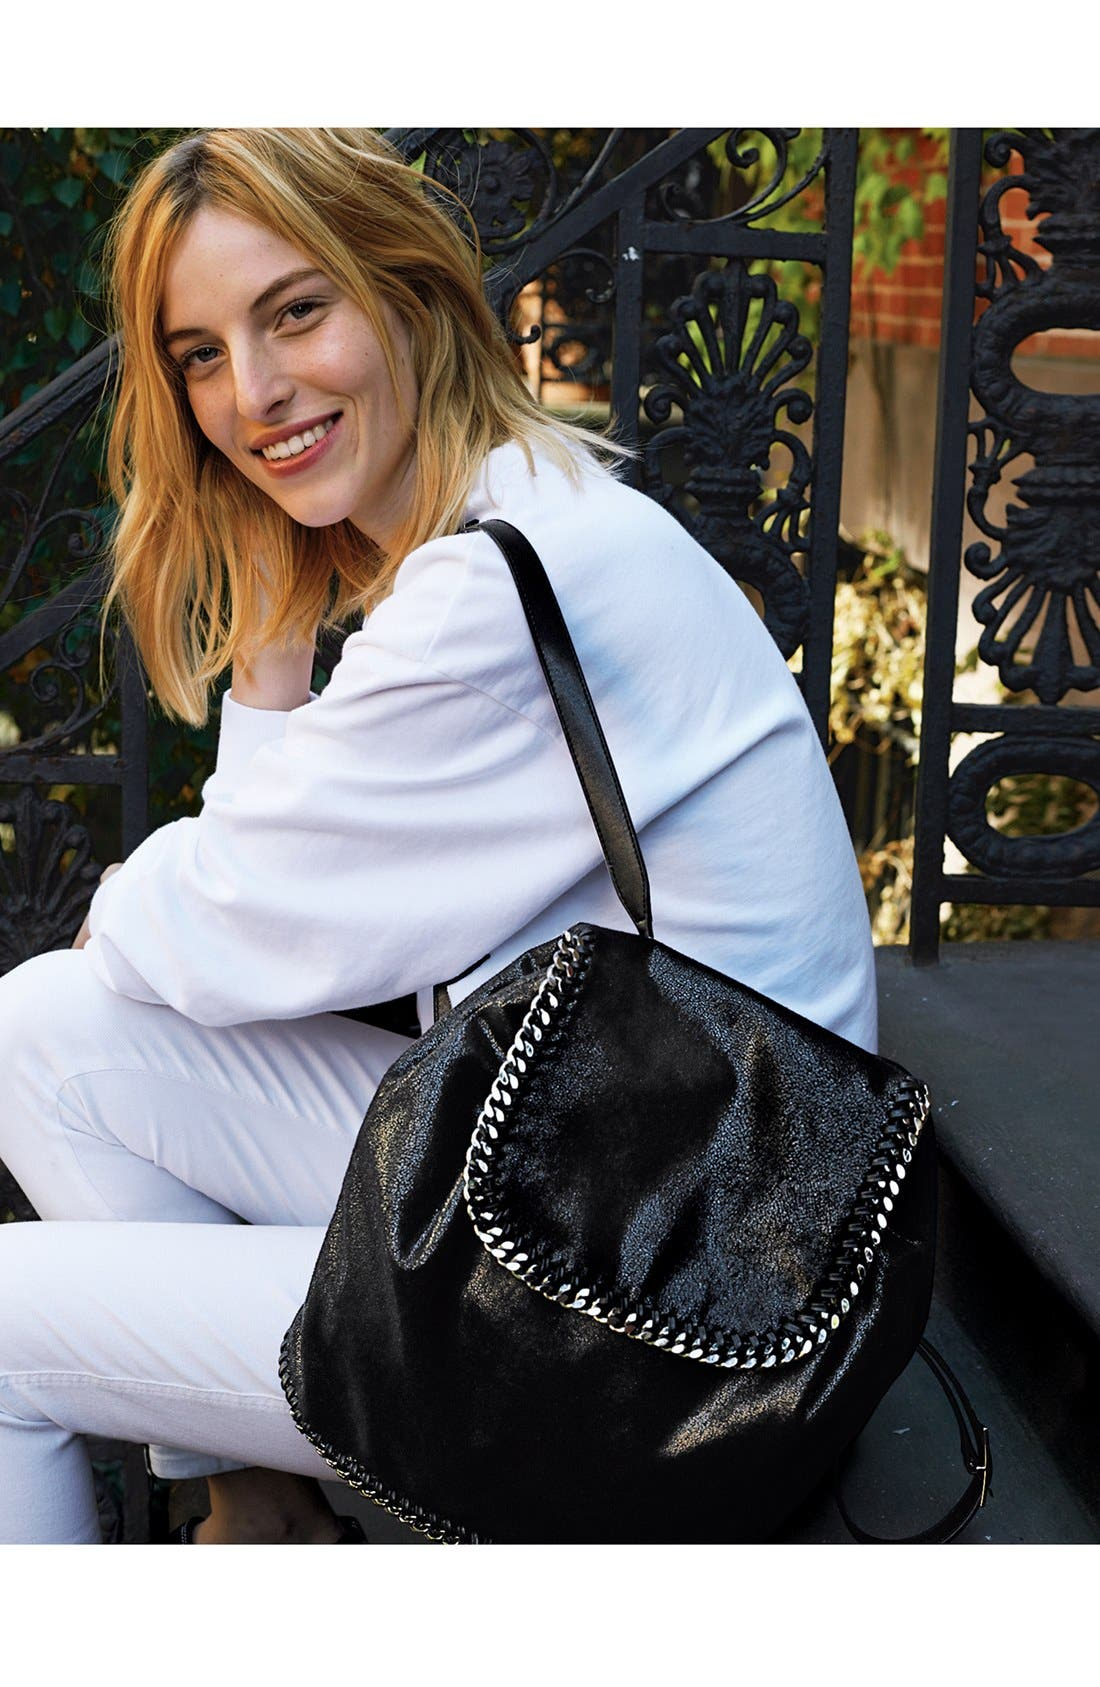 Main Image - Stella McCartney Faux Leather Backpack, Jeans & BLK Denim Sweatshirt